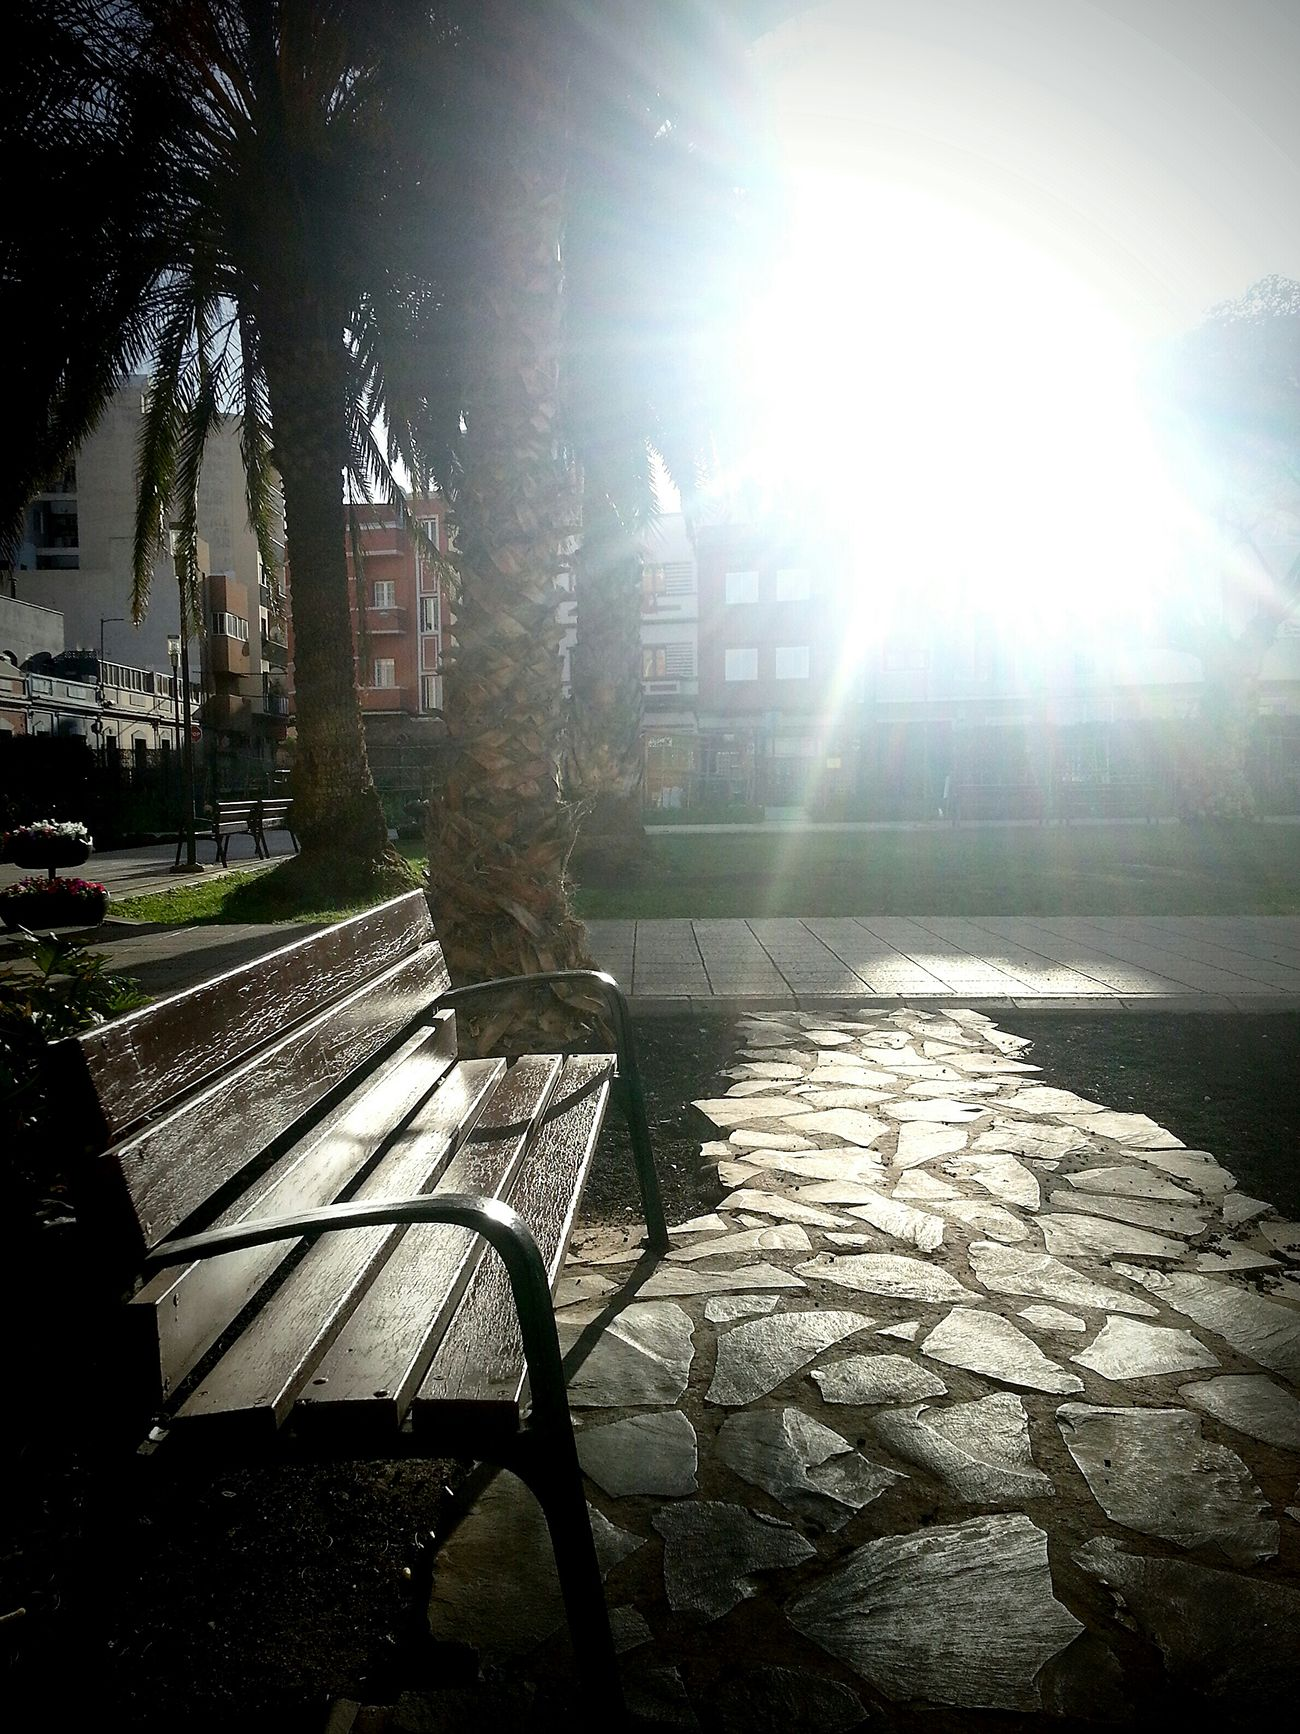 ★★☆HAPPY NEW YEAR EYEEMERS☆★★ | ★★☆FELIZ AÑO NUEVO EYEEMER@S☆★★ We Are Photography, We Are EyeEm Eye4photography  City Nature ...Rincones De Las Palmas ModernA...